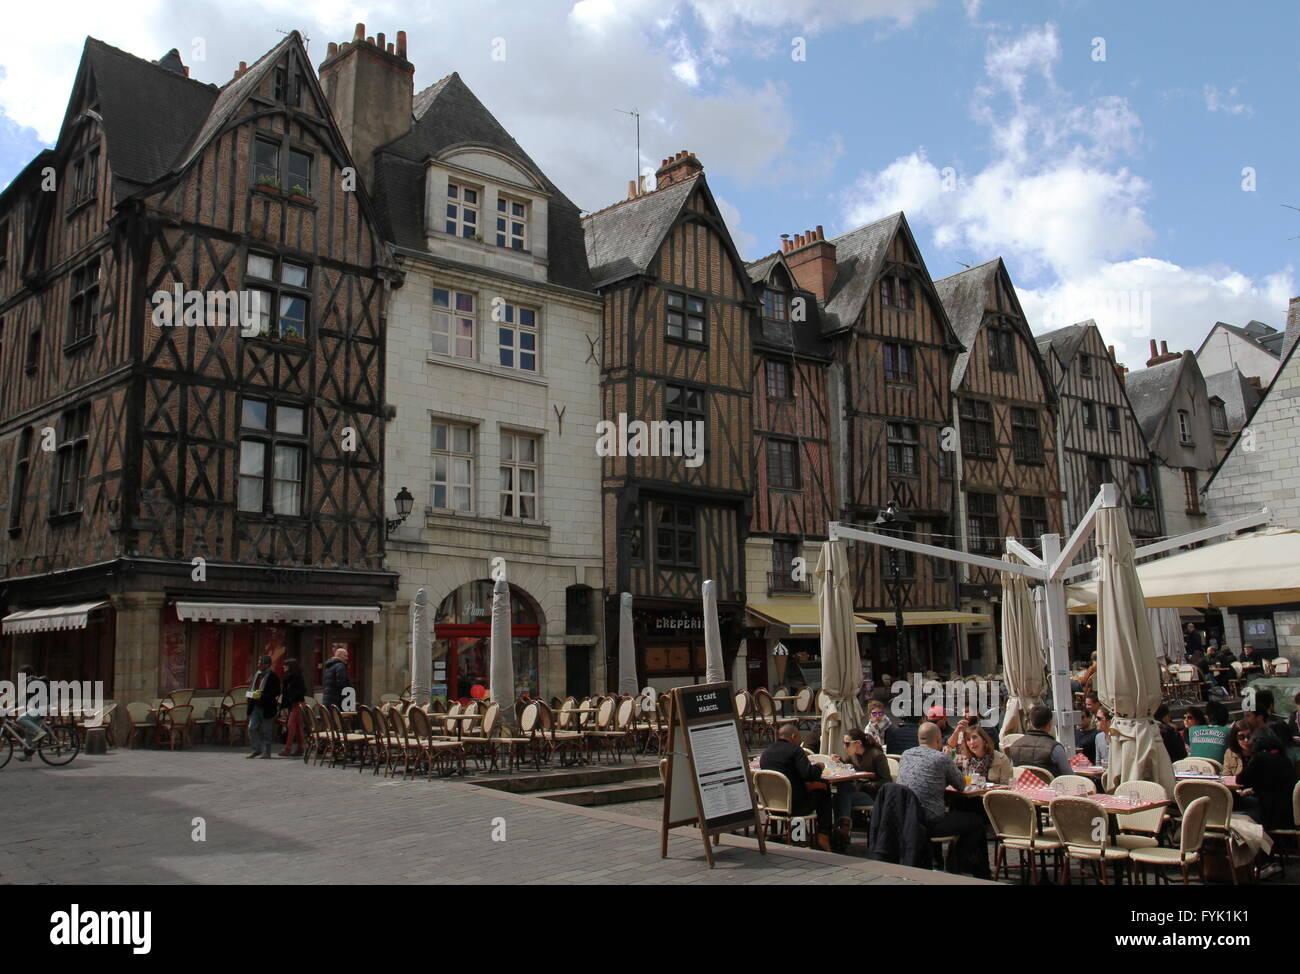 Sedie Francesi Usate : I tavoli e le sedie in piazza plumereau old town tours francia